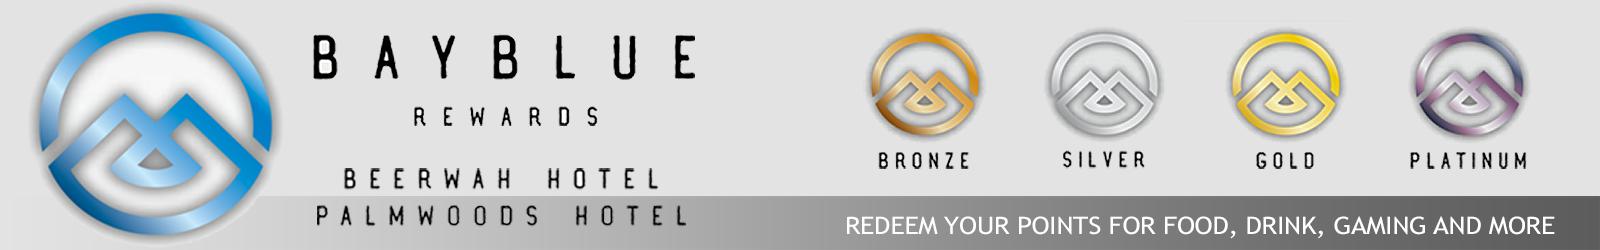 BayBlue-Rewards-1-1.png